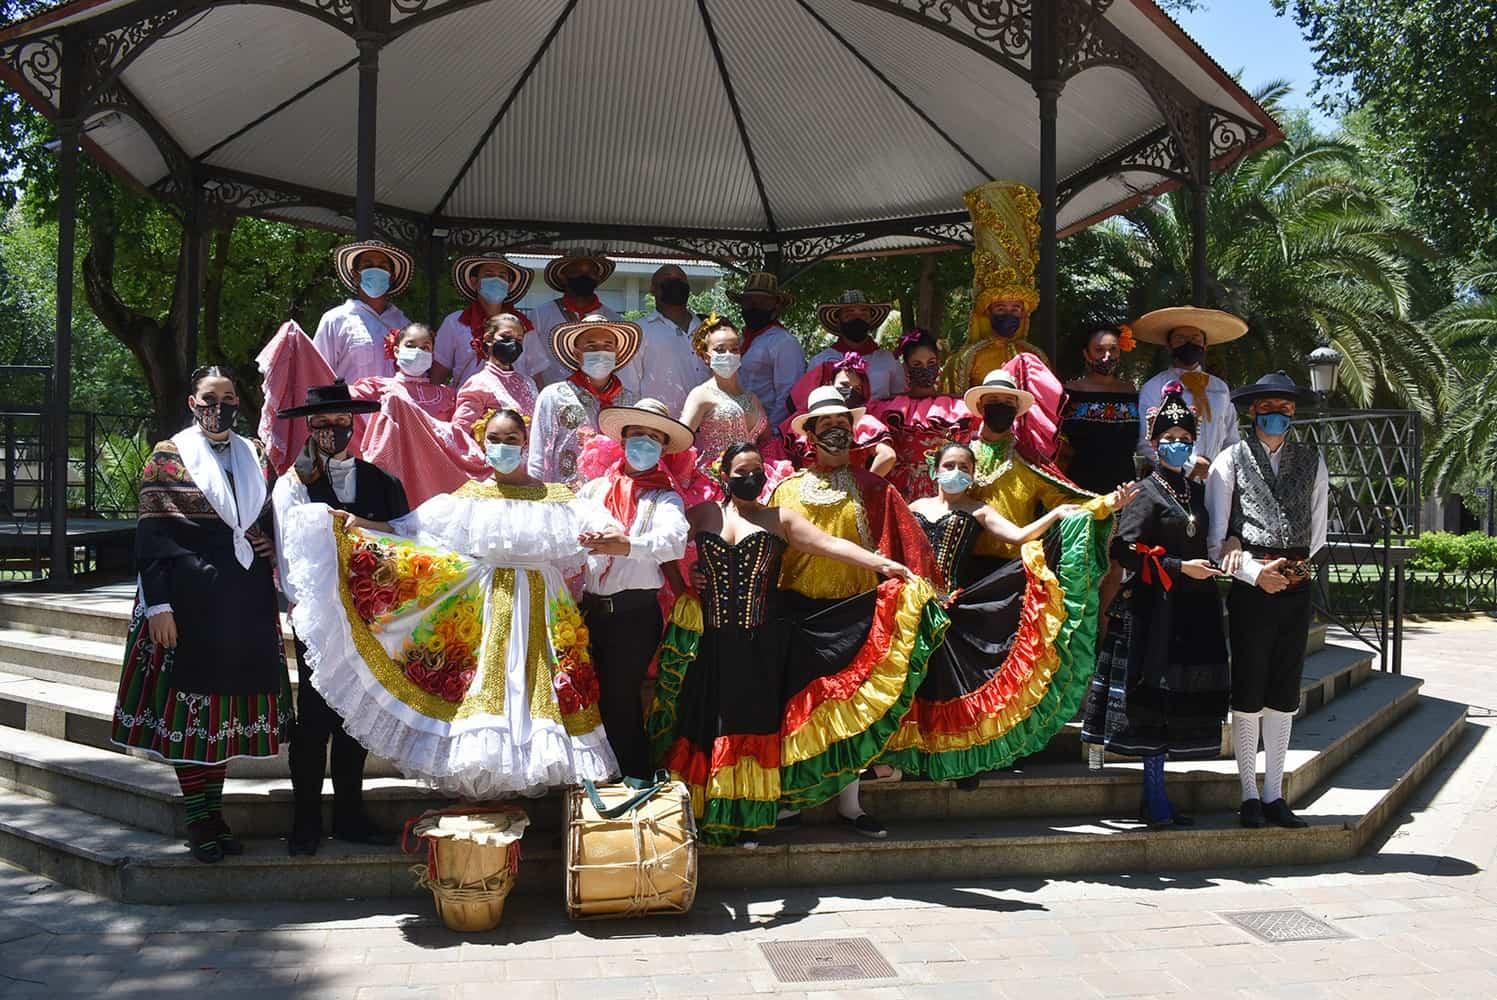 XXXIX edición del Festival Internacional del Folclore y la 42ª edición del Festival de la Seguidilla